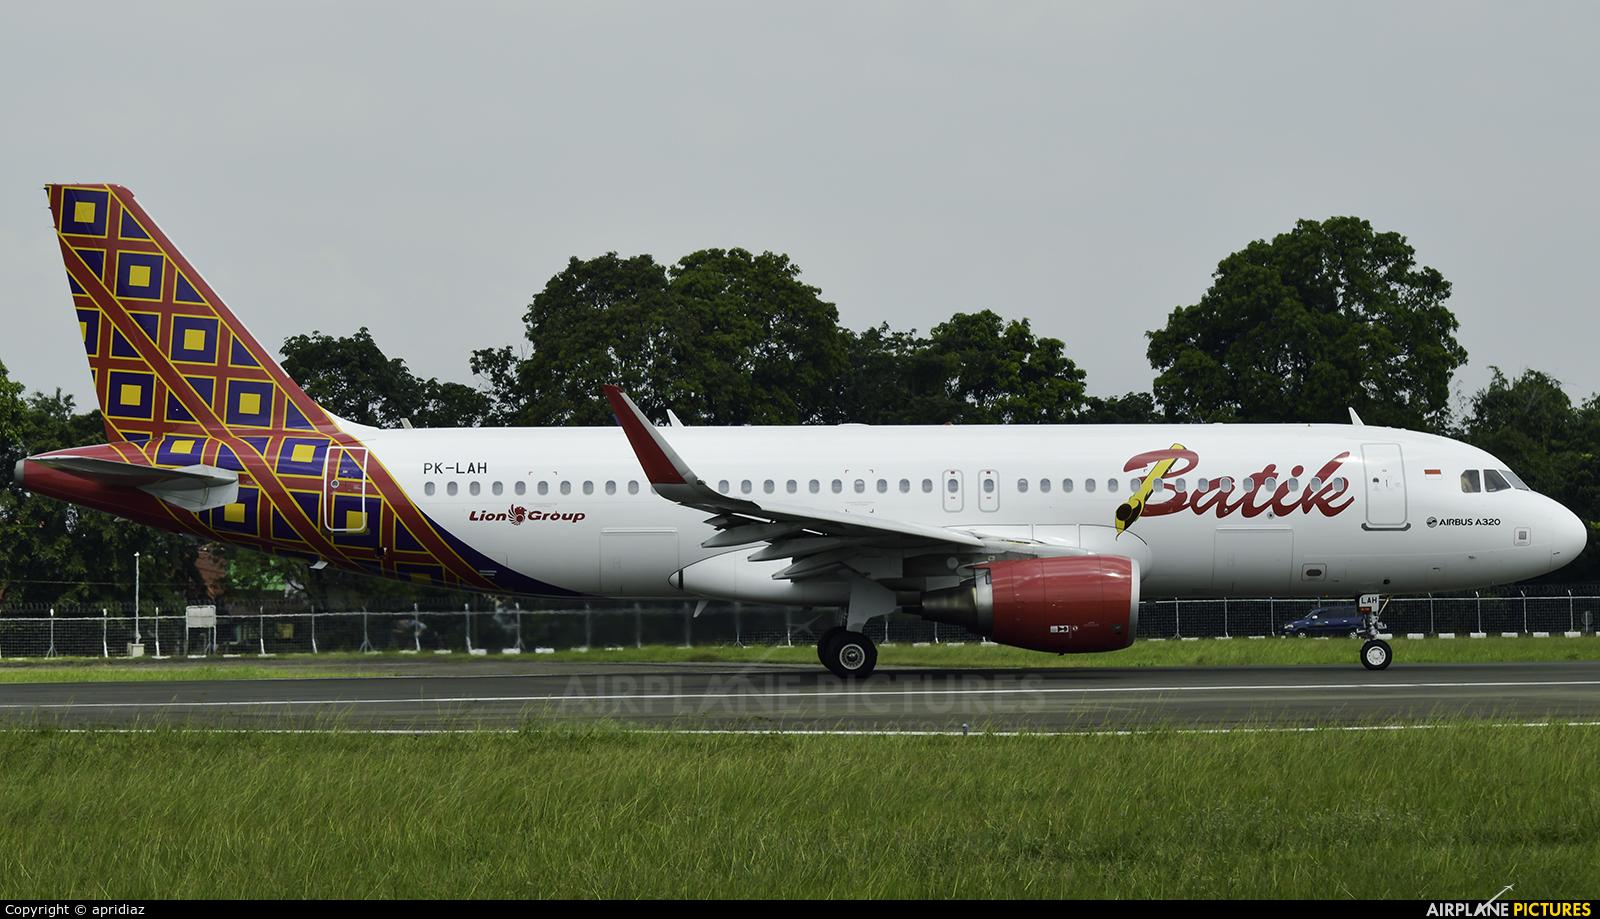 Batik Air PK-LAH aircraft at In Flight - Indonesia